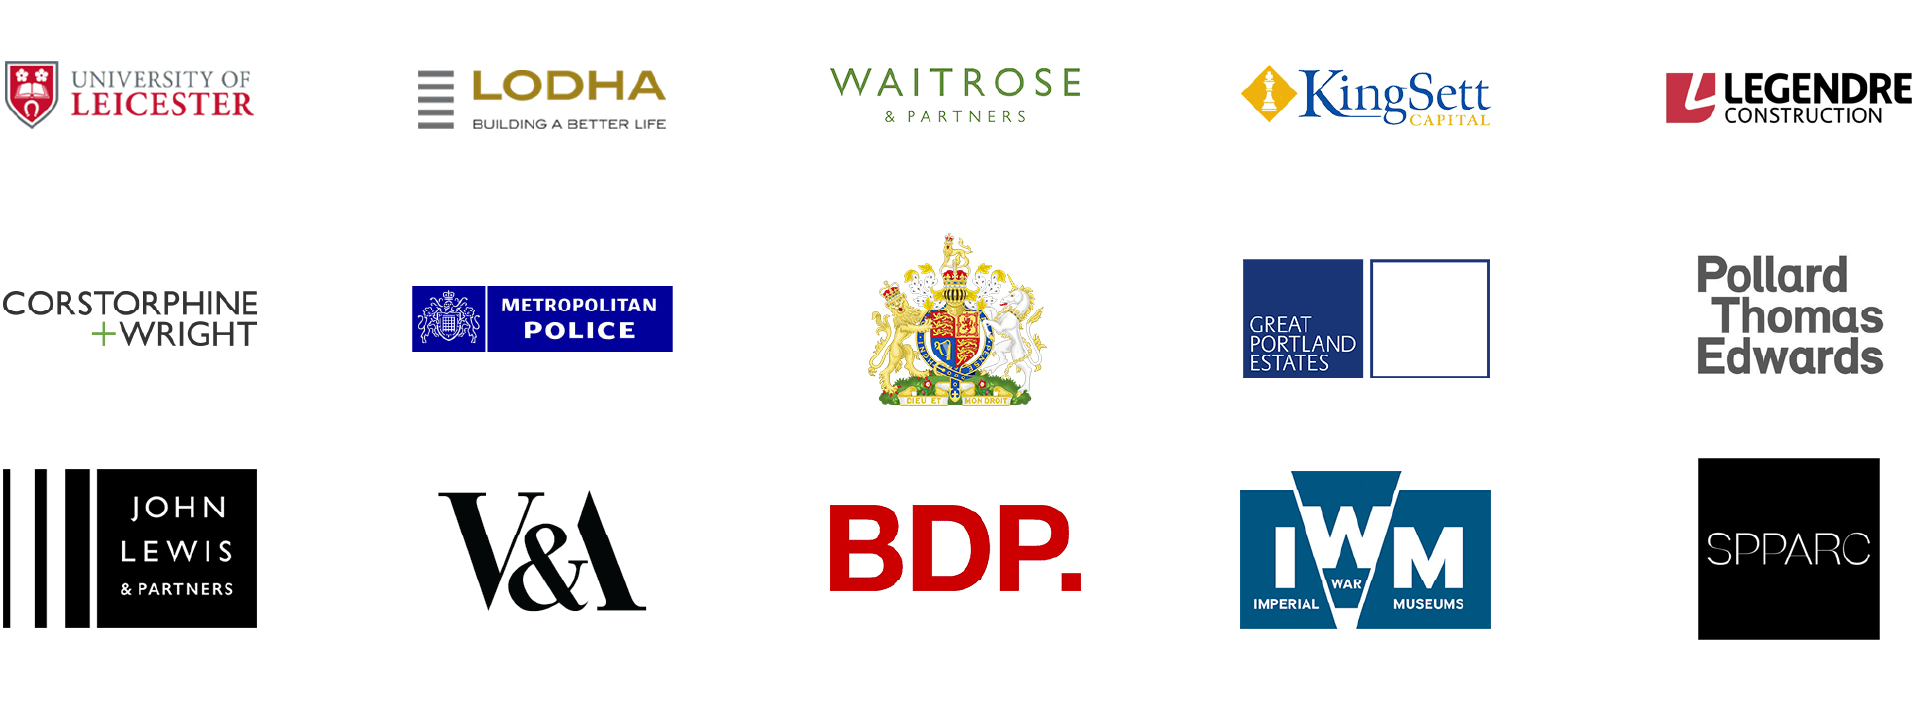 Client logos including University of Leicester, Lodha, Waitrose, KingSett, Legndre Construction, Corstorphine + Wright, Metropolitan Poluce, Great Portland Estates, John Lewis, V&A, Pollard Thomas Edwards., BDP, IWM, SPPARC